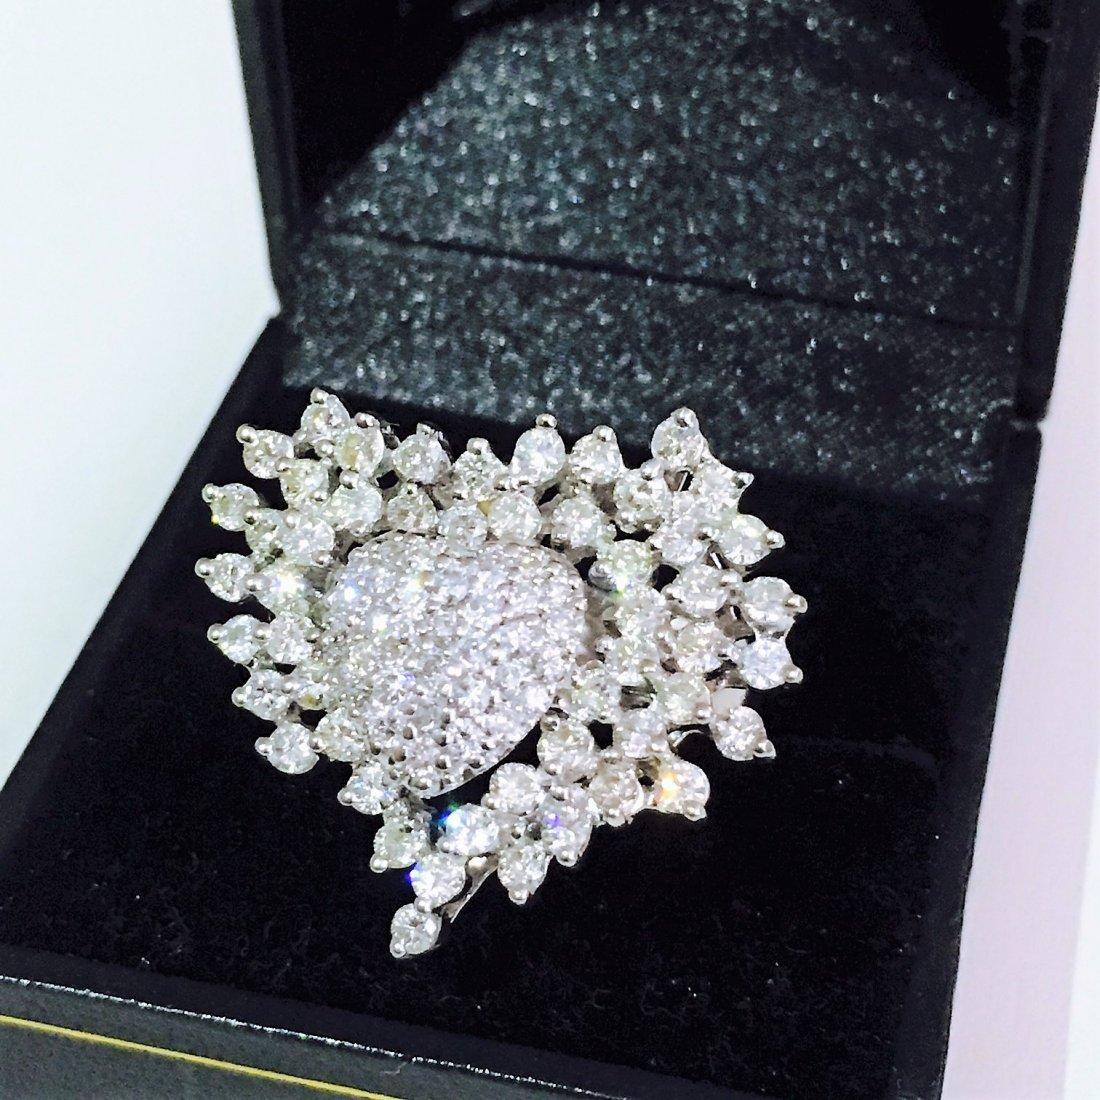 14k Gold. Heart Shape 4.50 Carat Diamond Ring